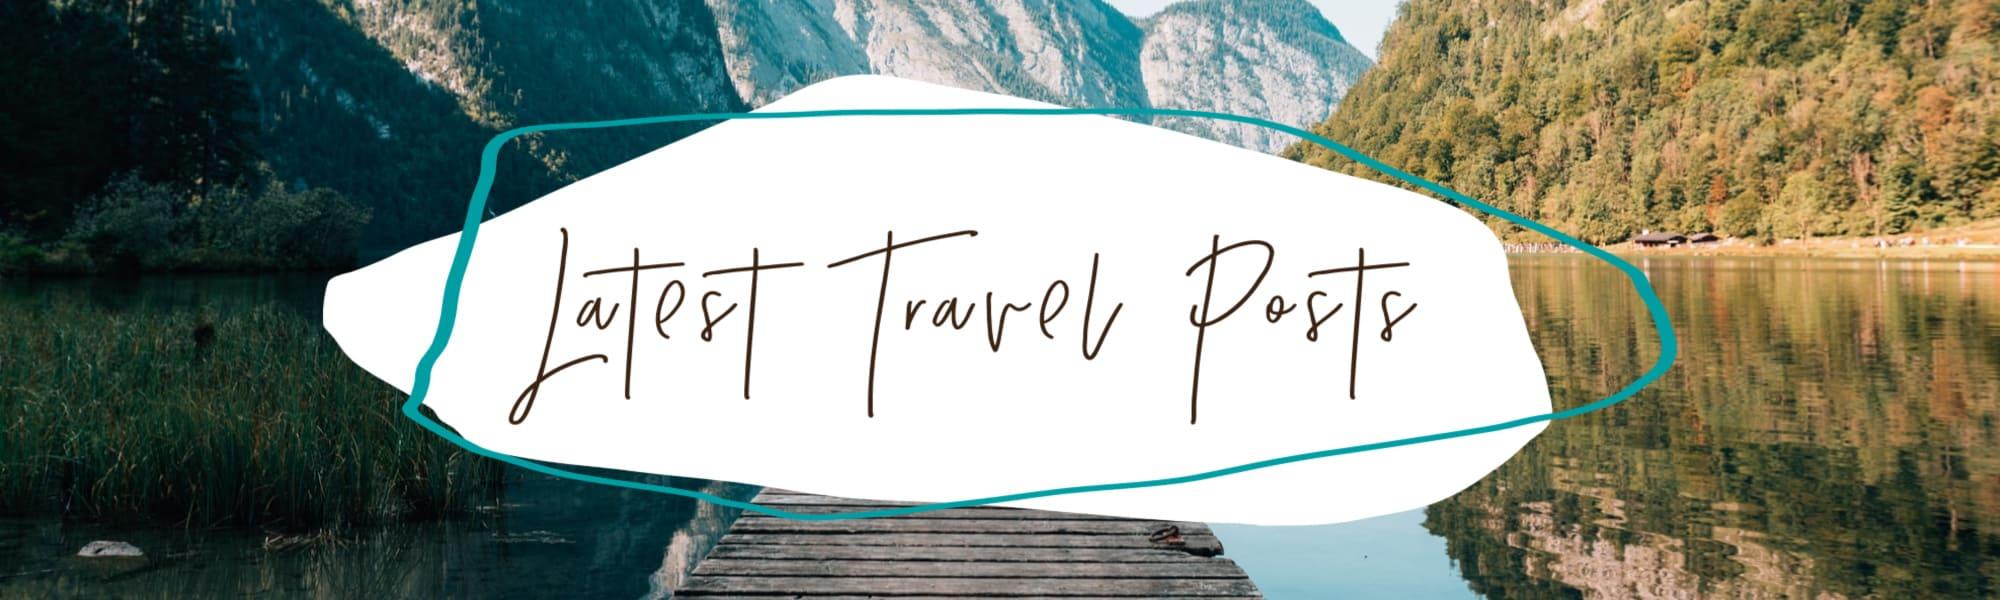 Latest travel posts